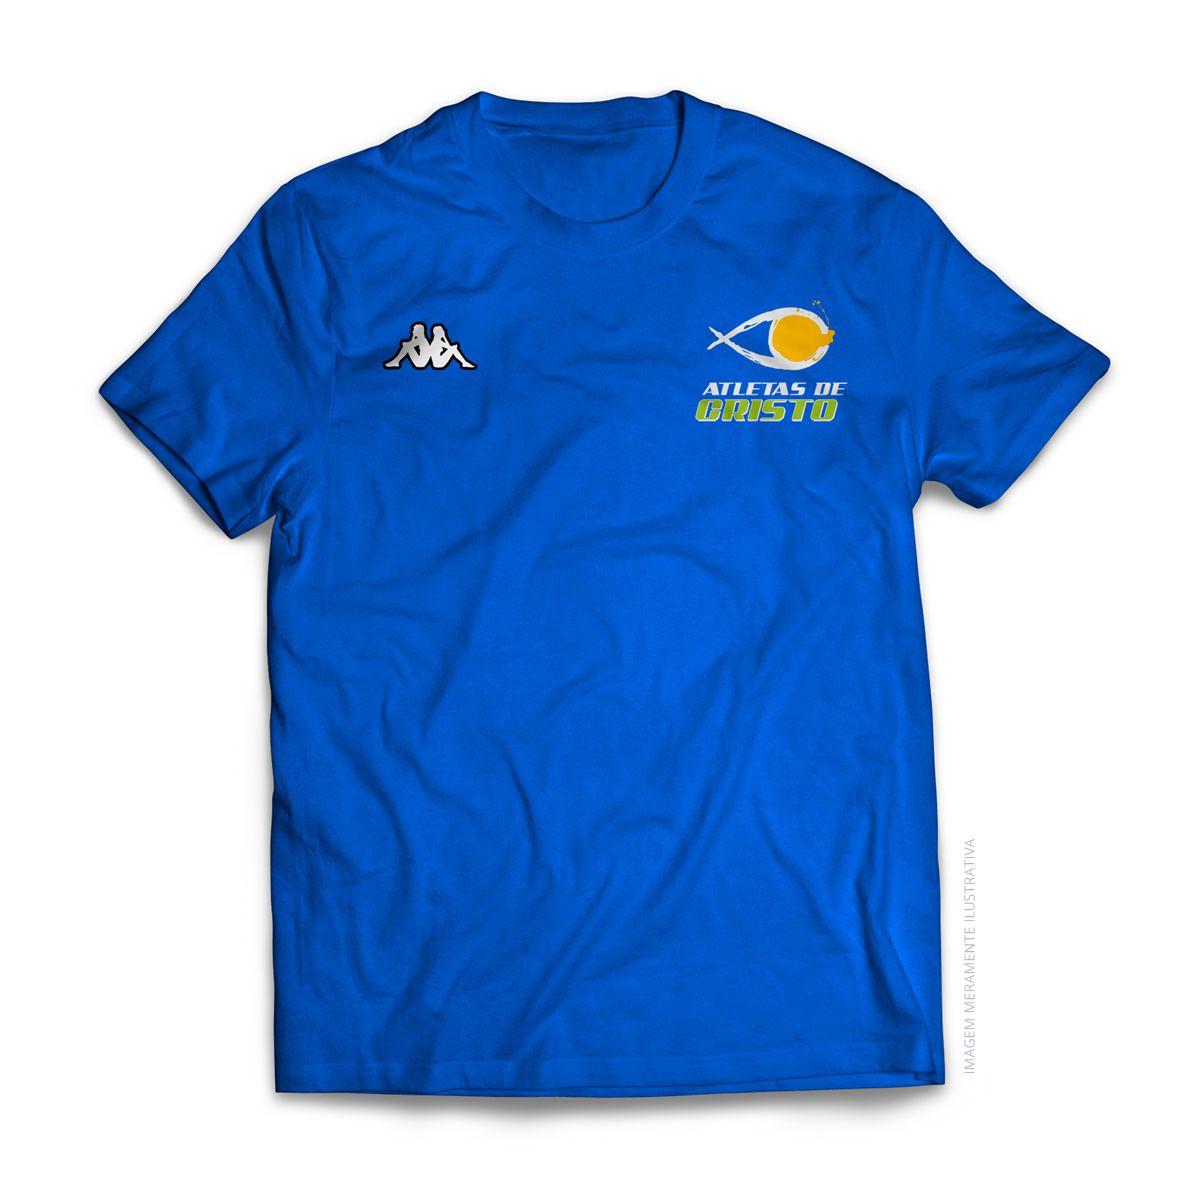 Camiseta Kappa - Atletas de Cristo - Azul Royal